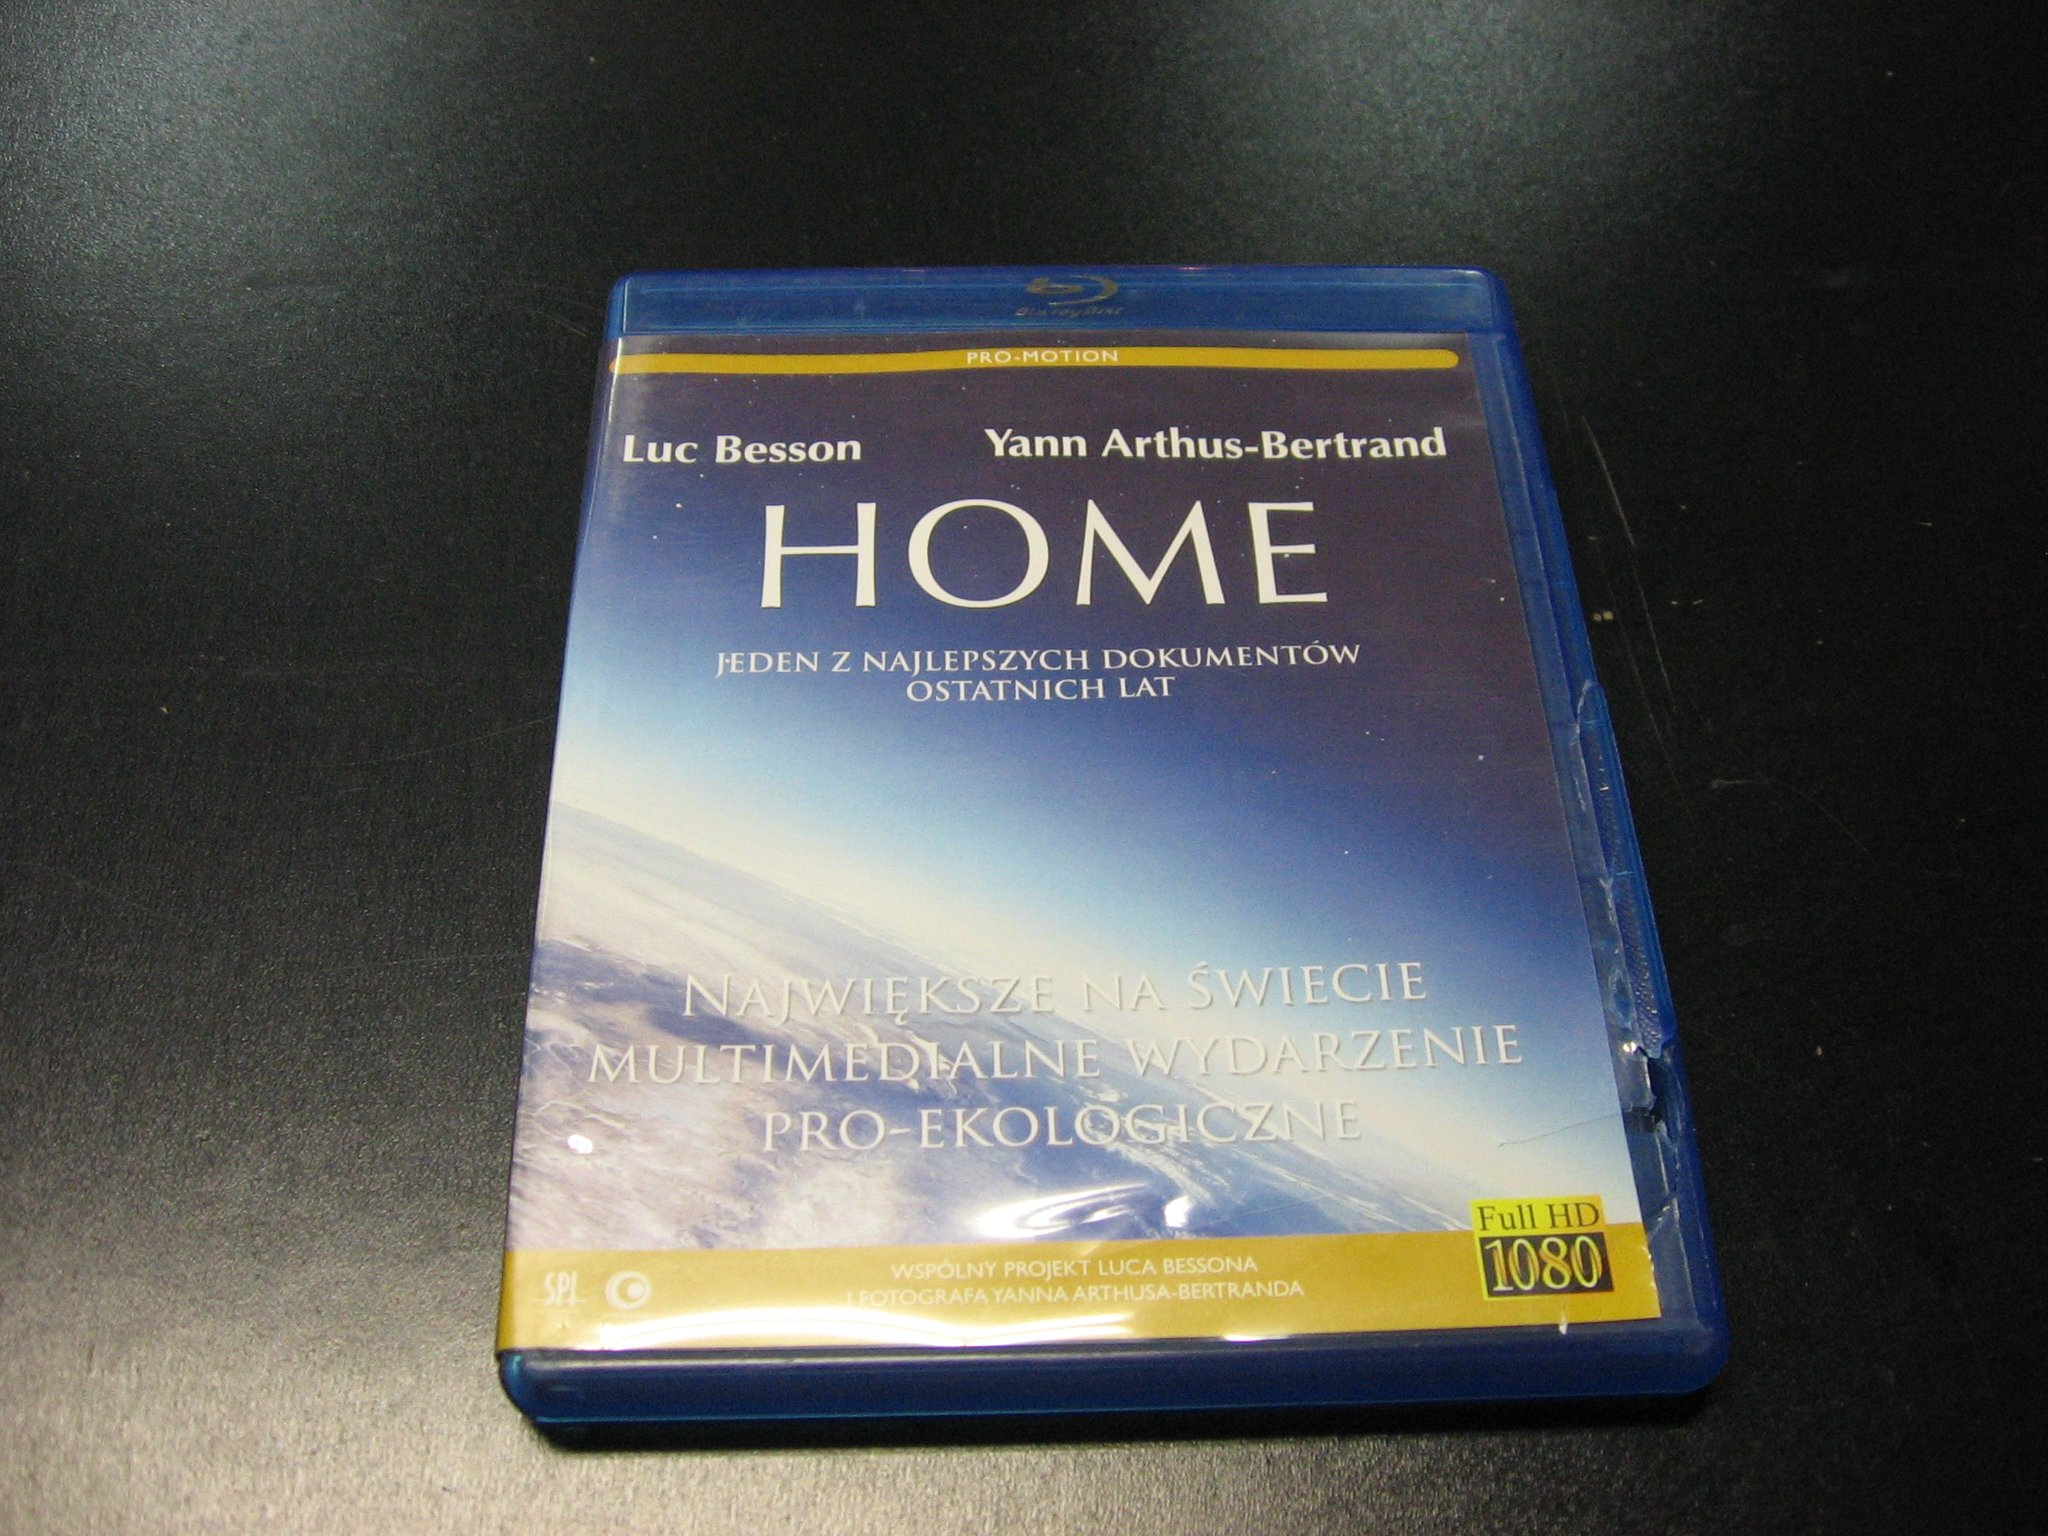 HOME 055 `````````` Blu-rey ```````````` Opole